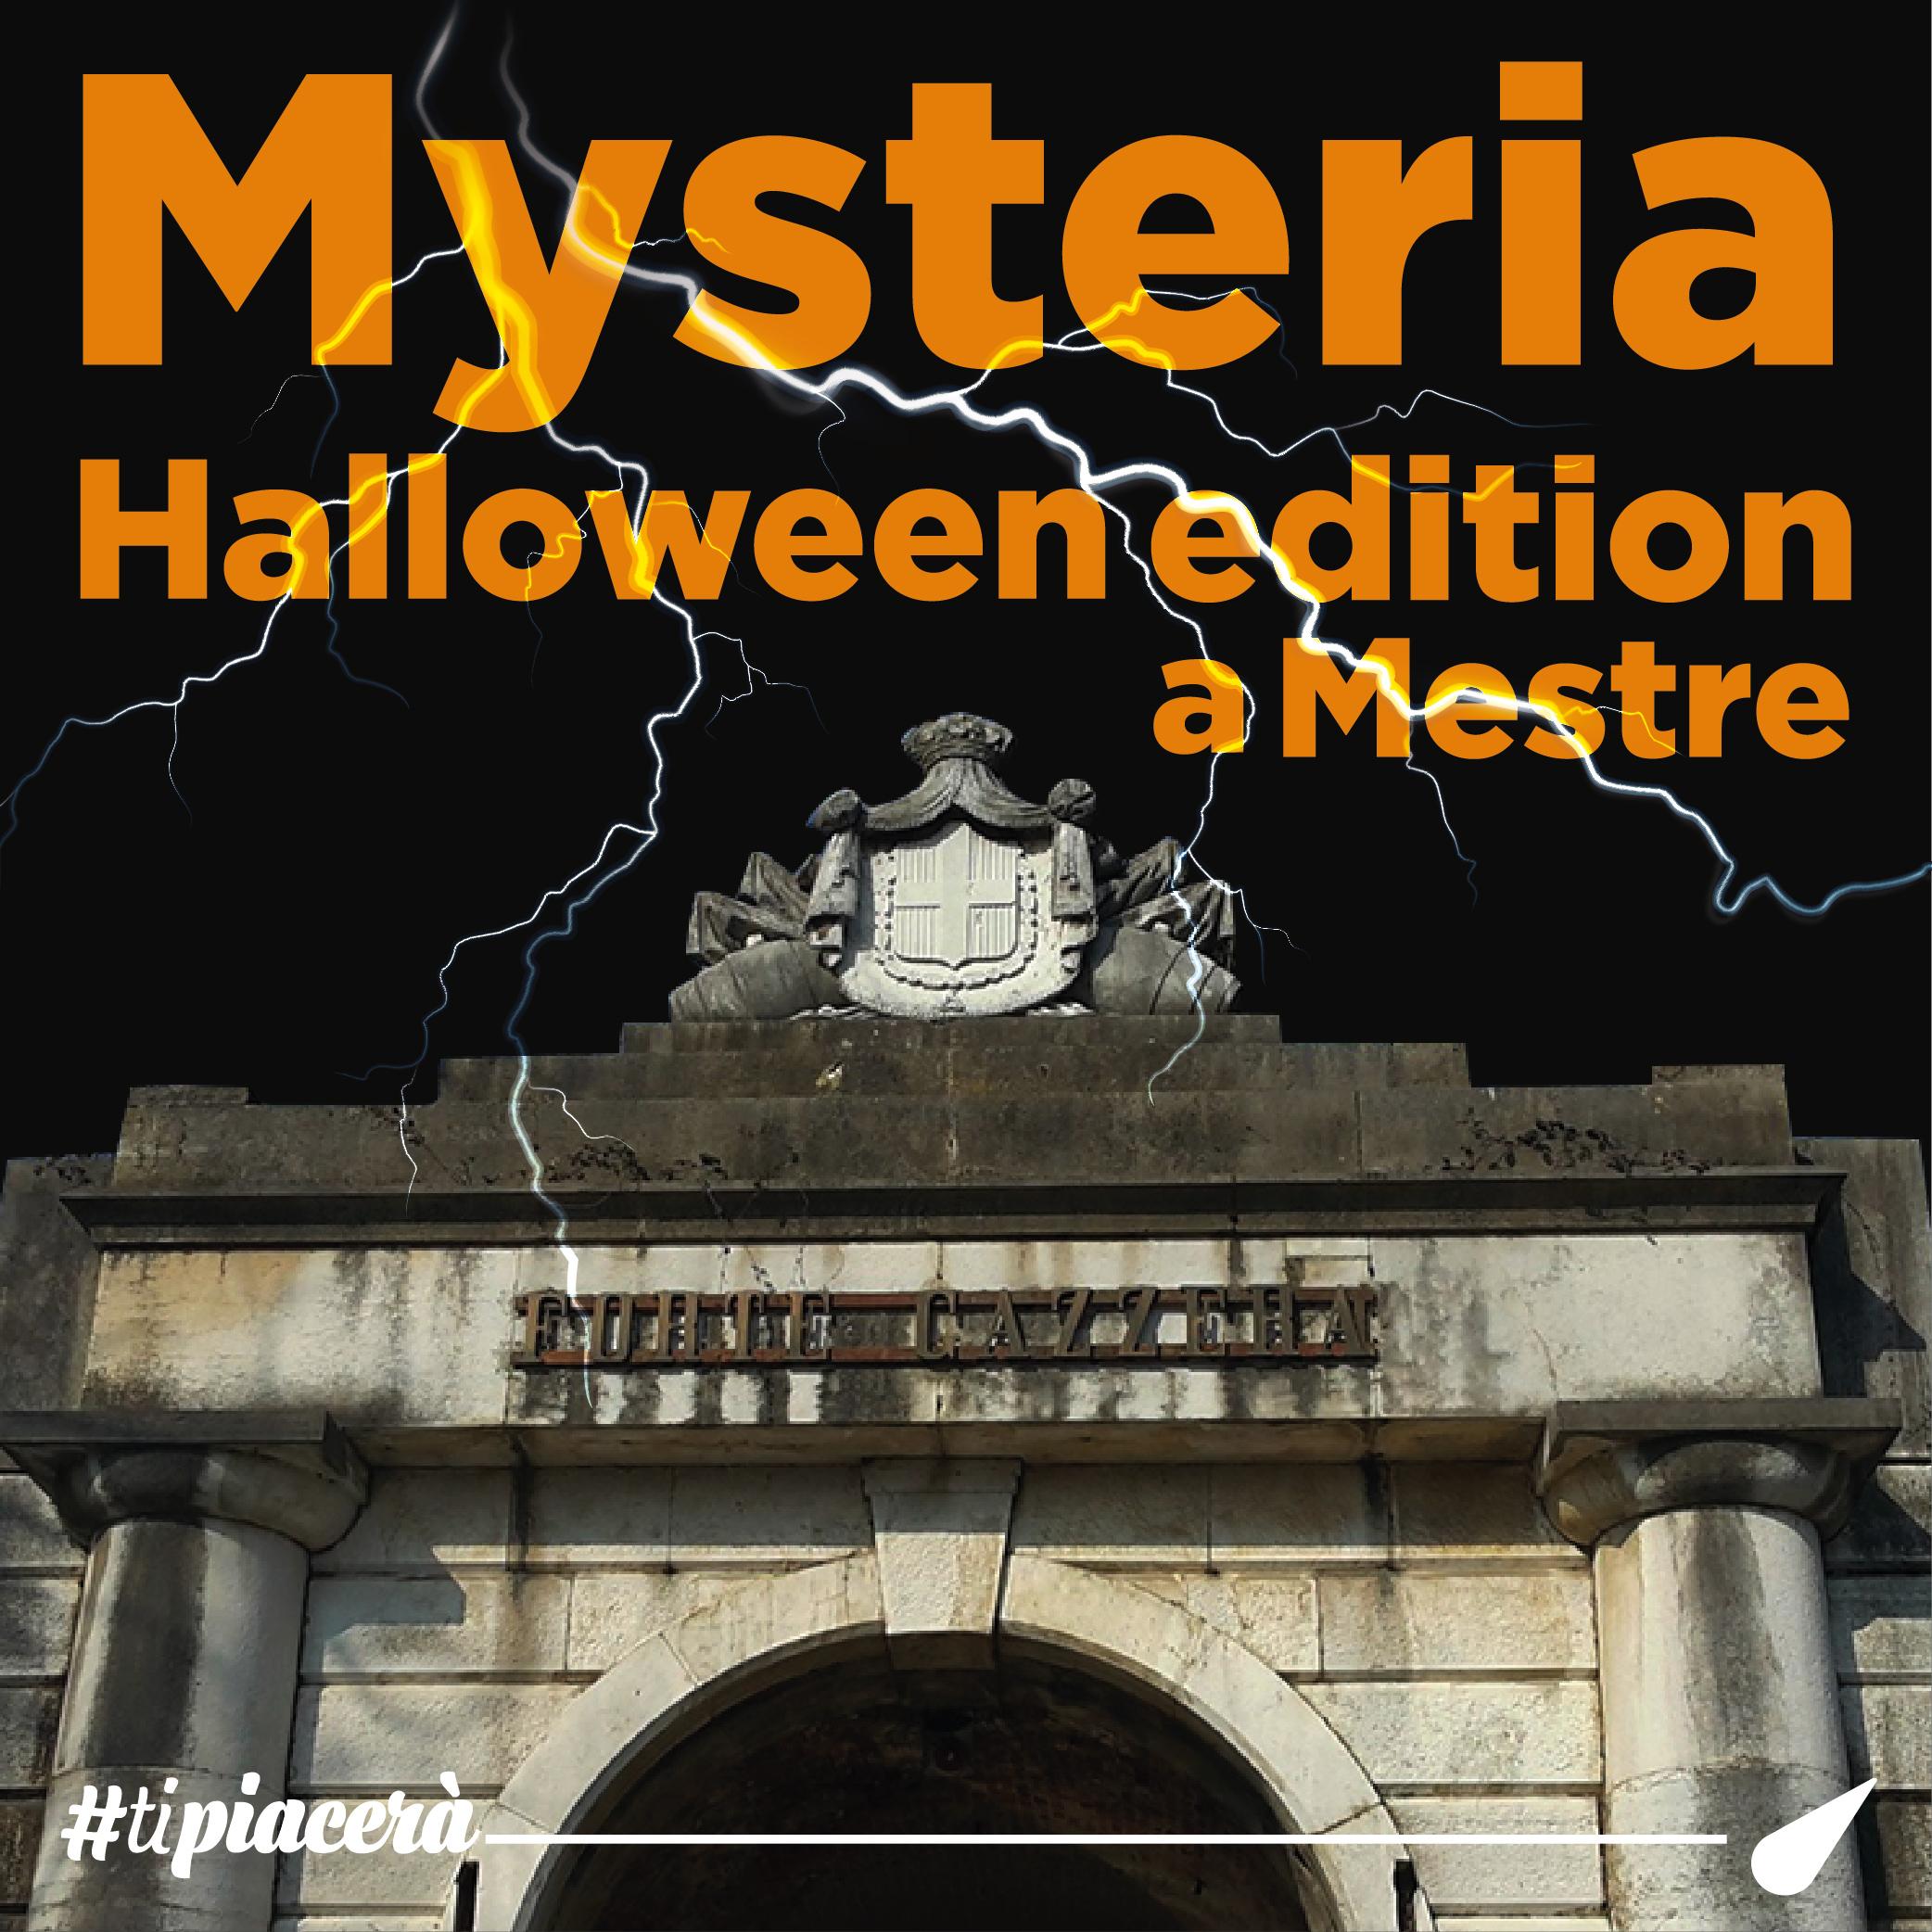 Mysteria Halloween edition a Mestre